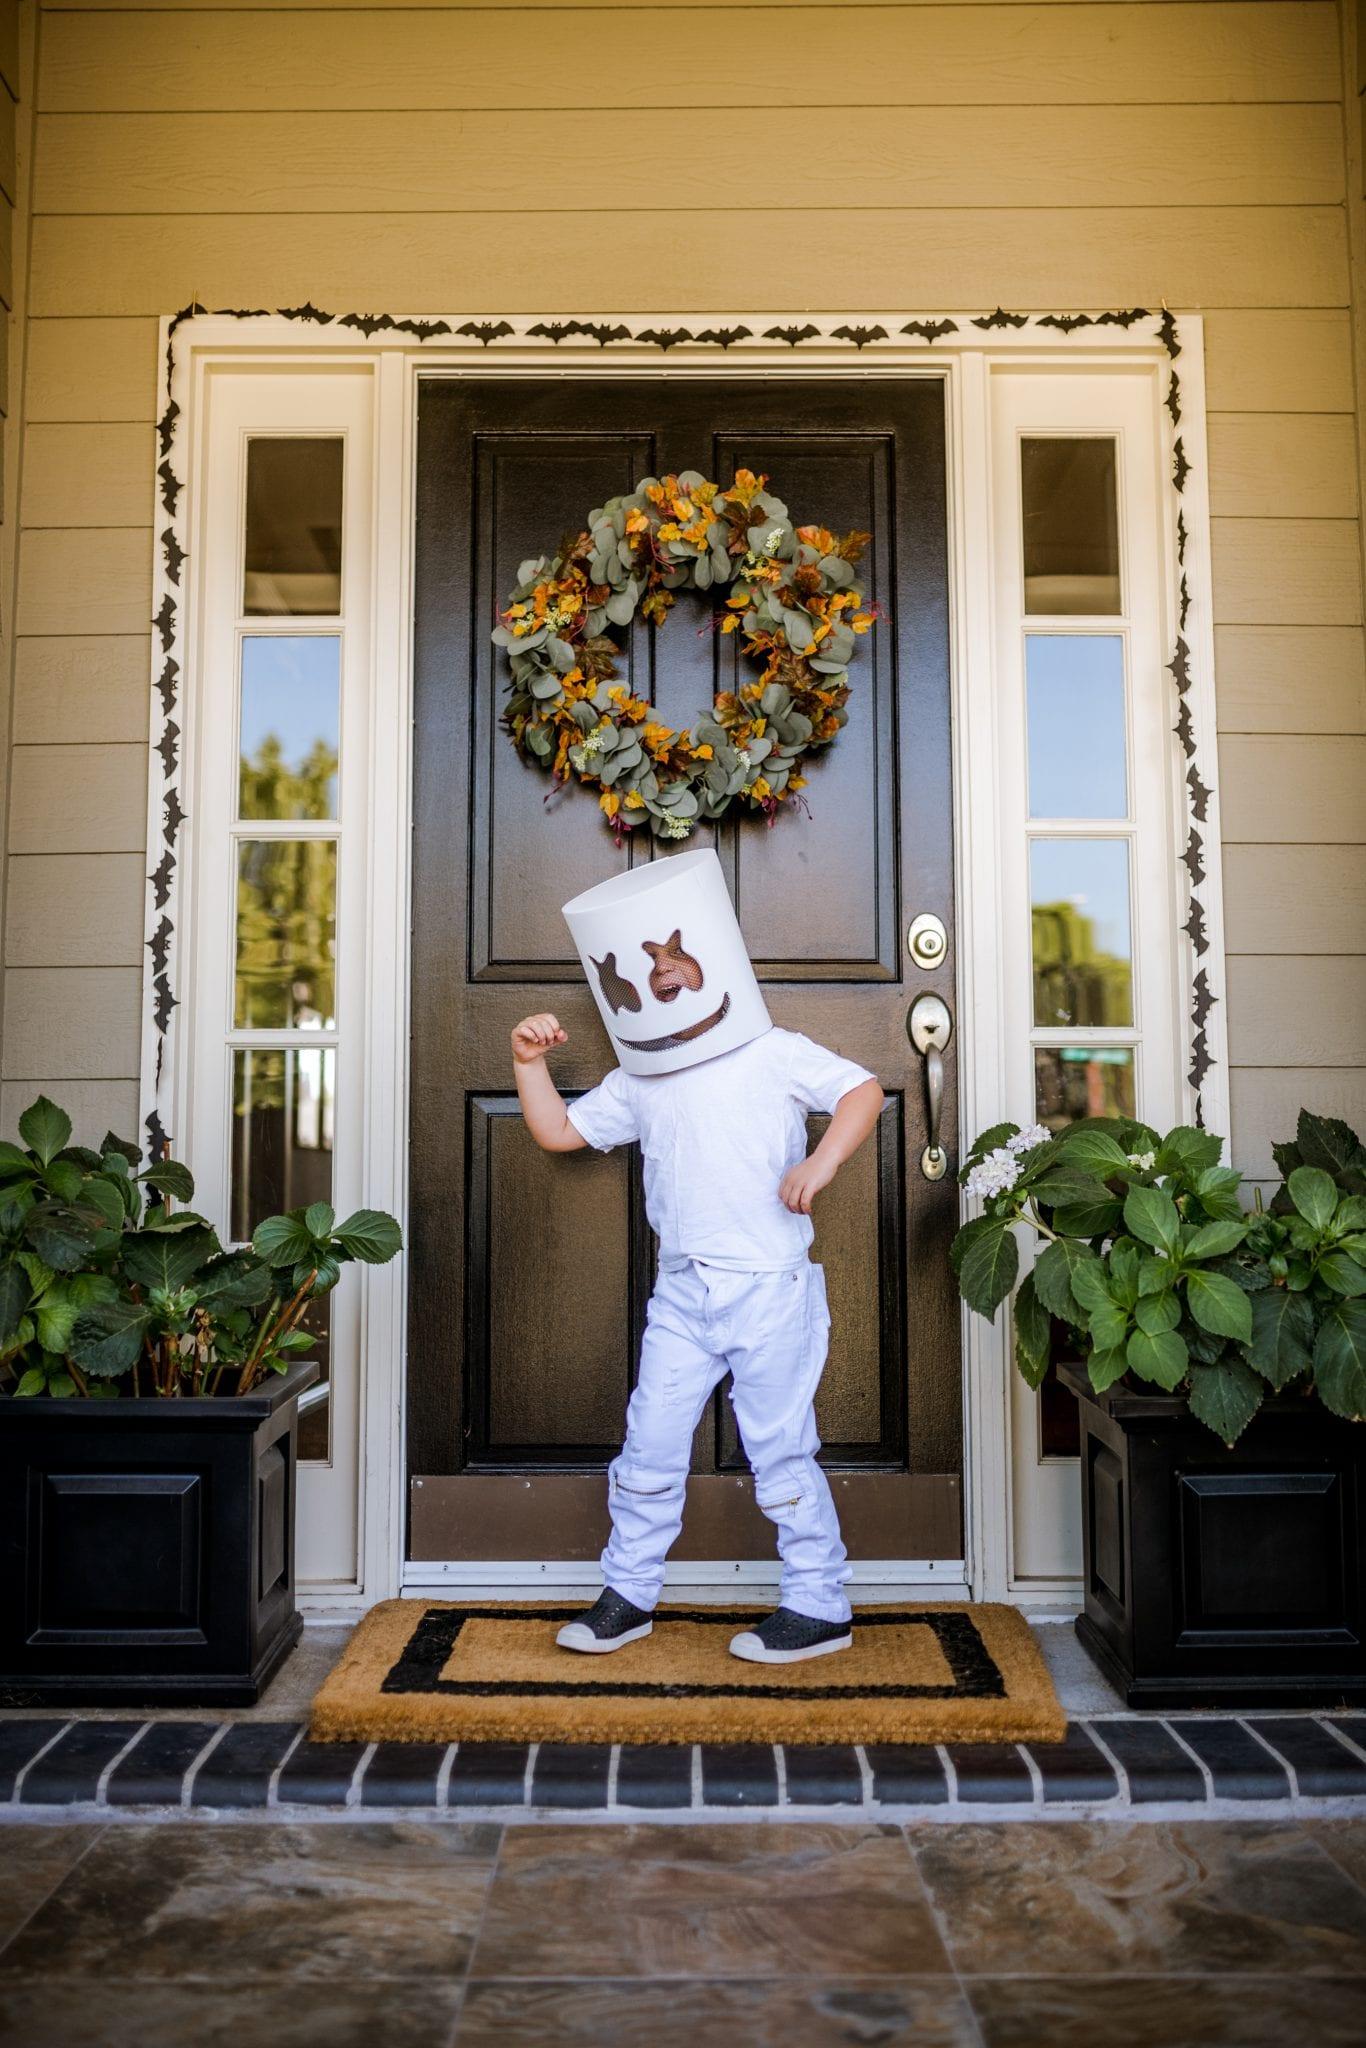 Eli's easy DJ Marshmello costume for Halloween